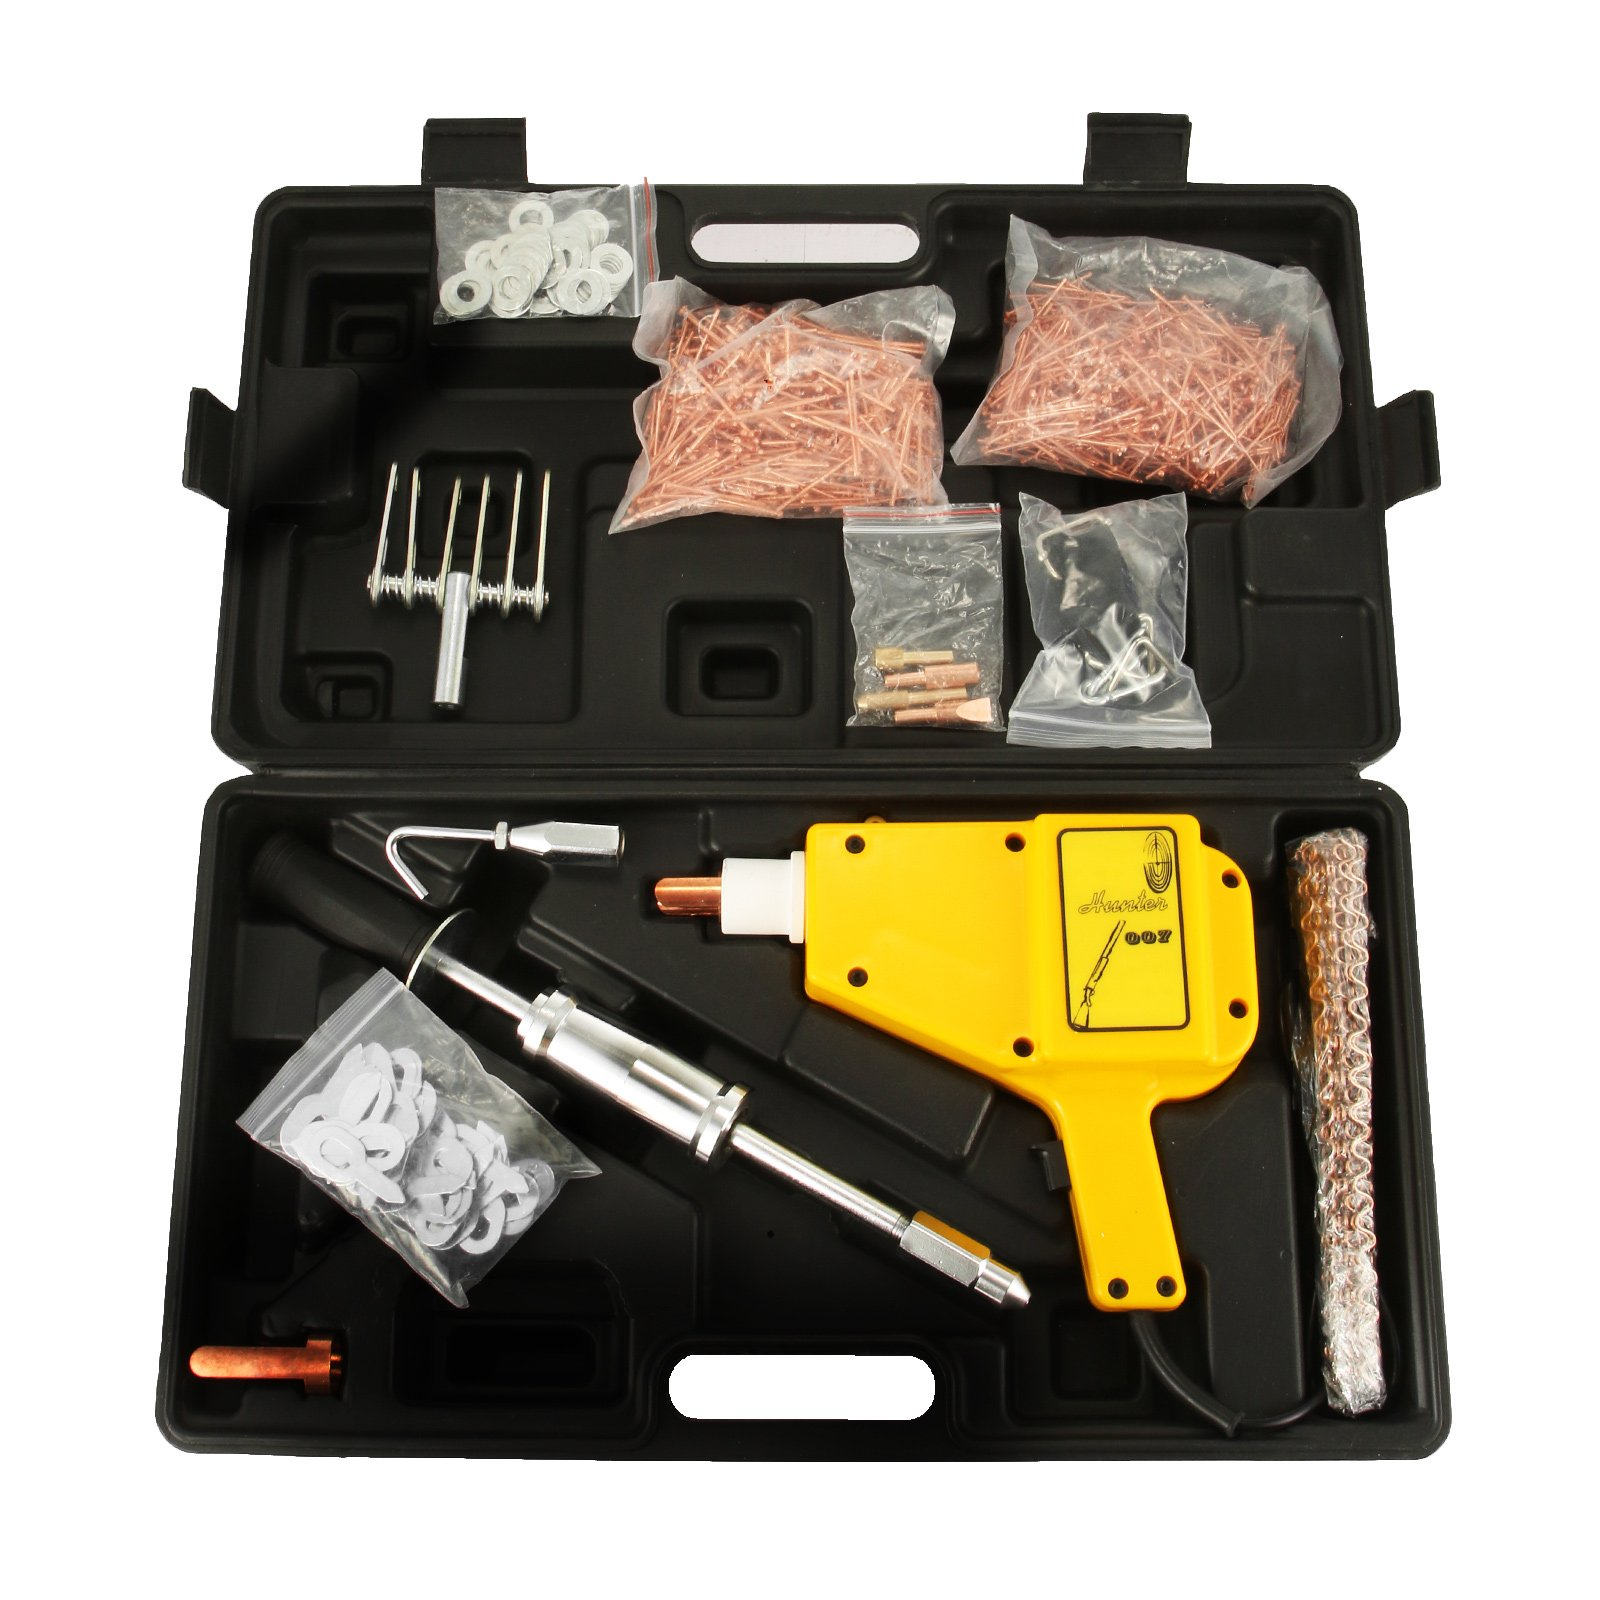 Mophorn Stud Welder Dent Repair Kit 1600A Stinger Stud Welder Kit 800 VA Welder Kit for Car Bump Repairing